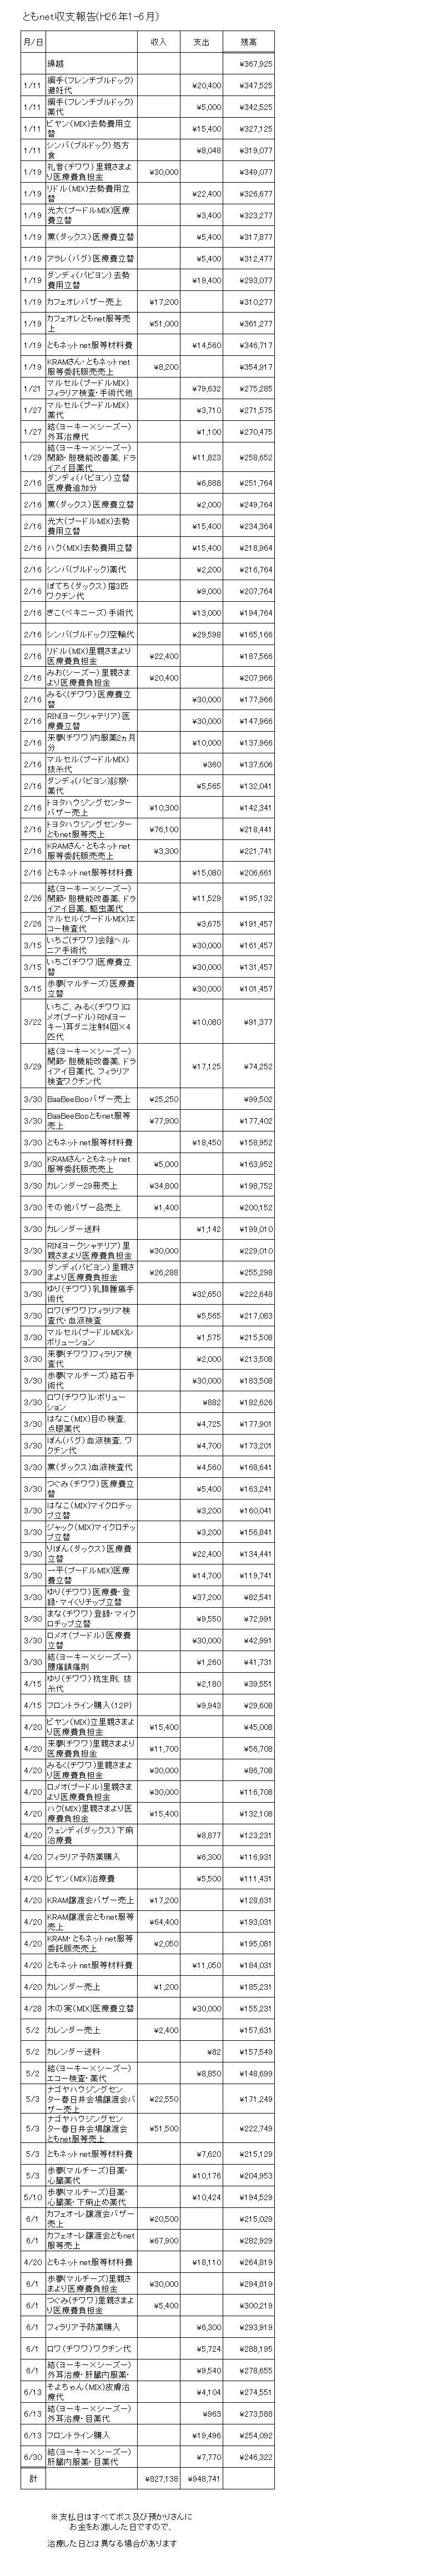 収支報告1-6